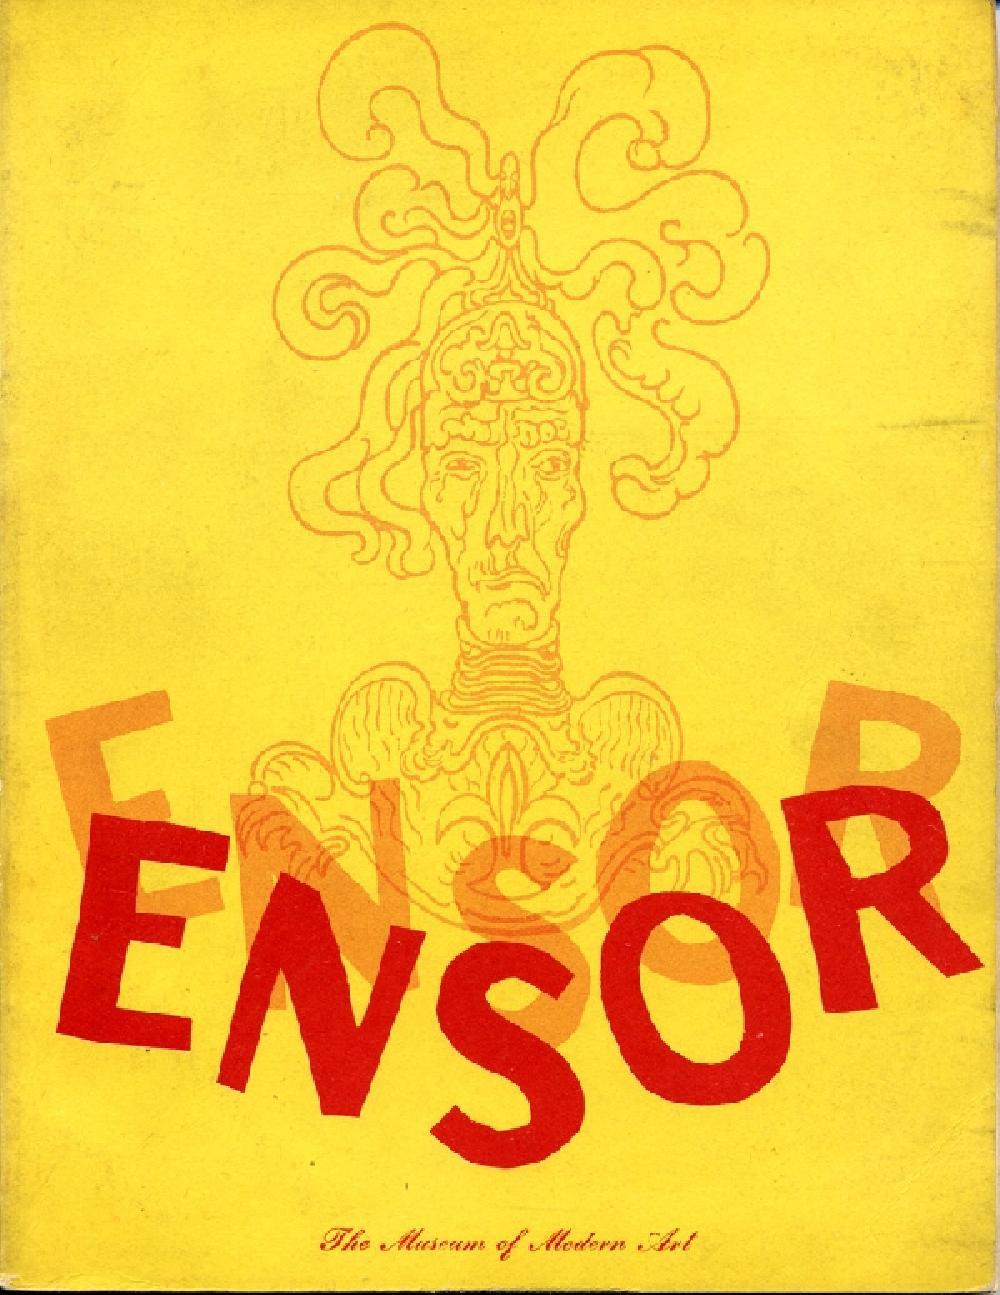 Ensor